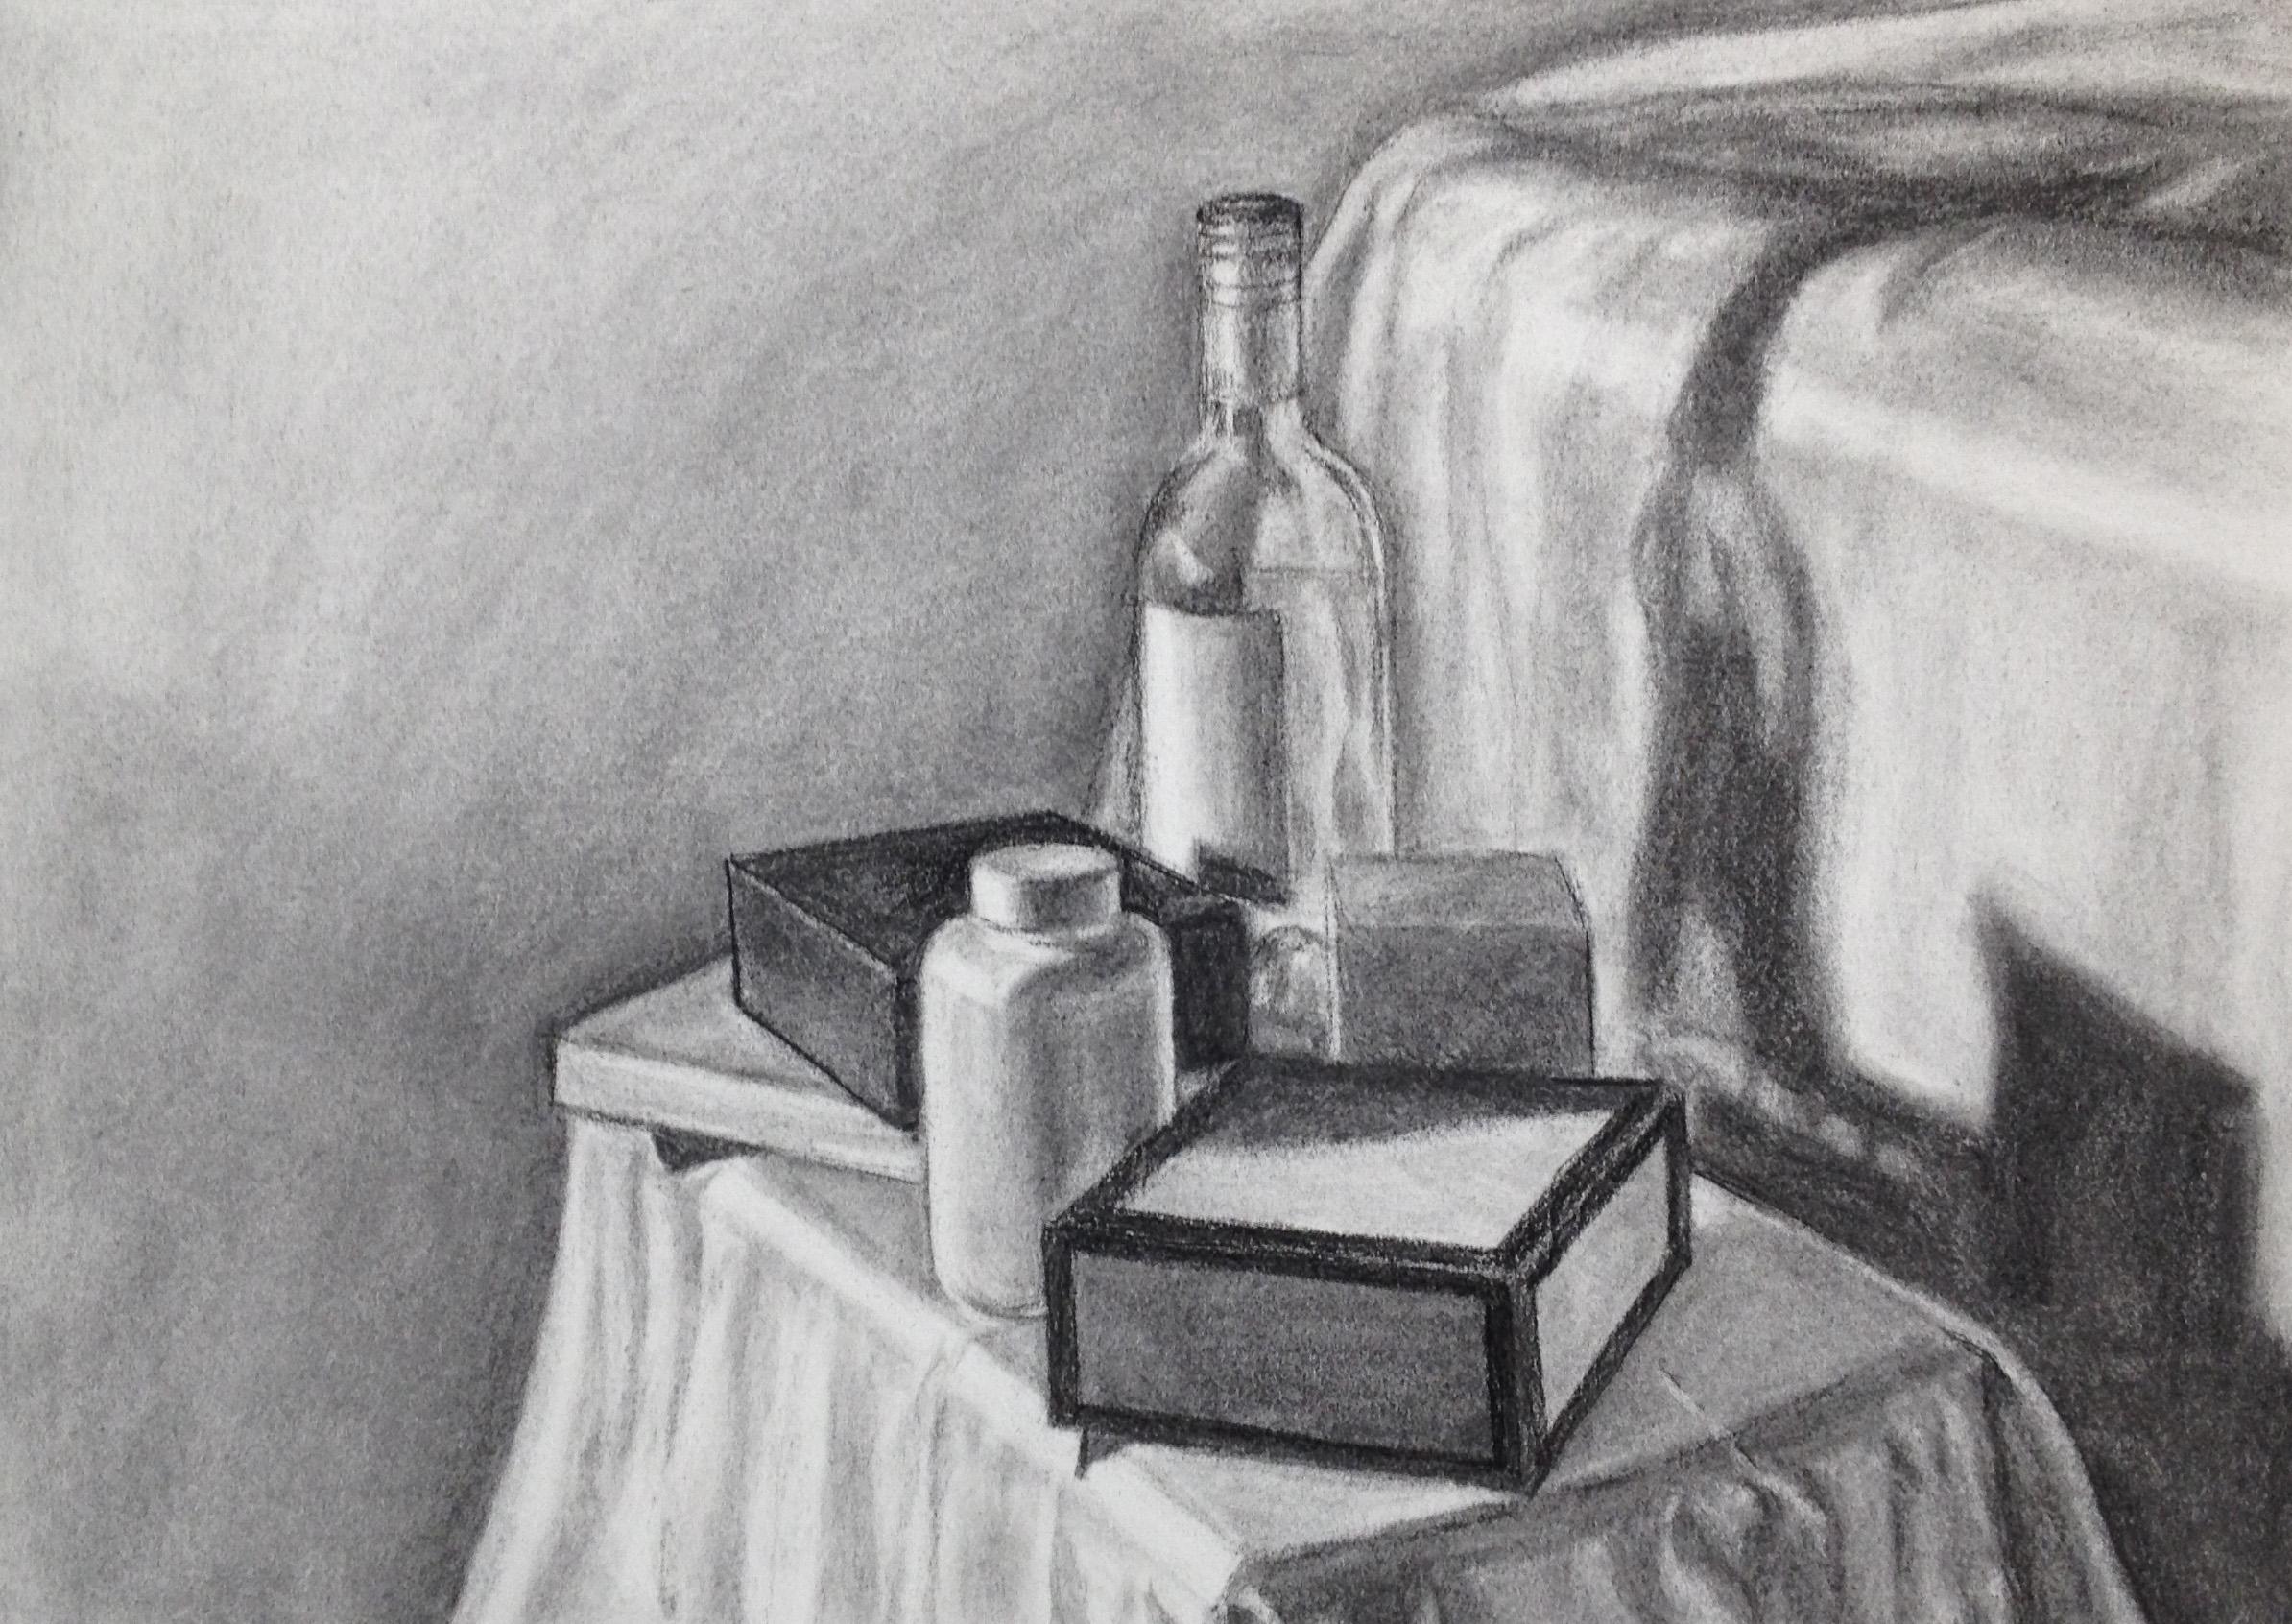 Black & White Still Life by Nancy Williams